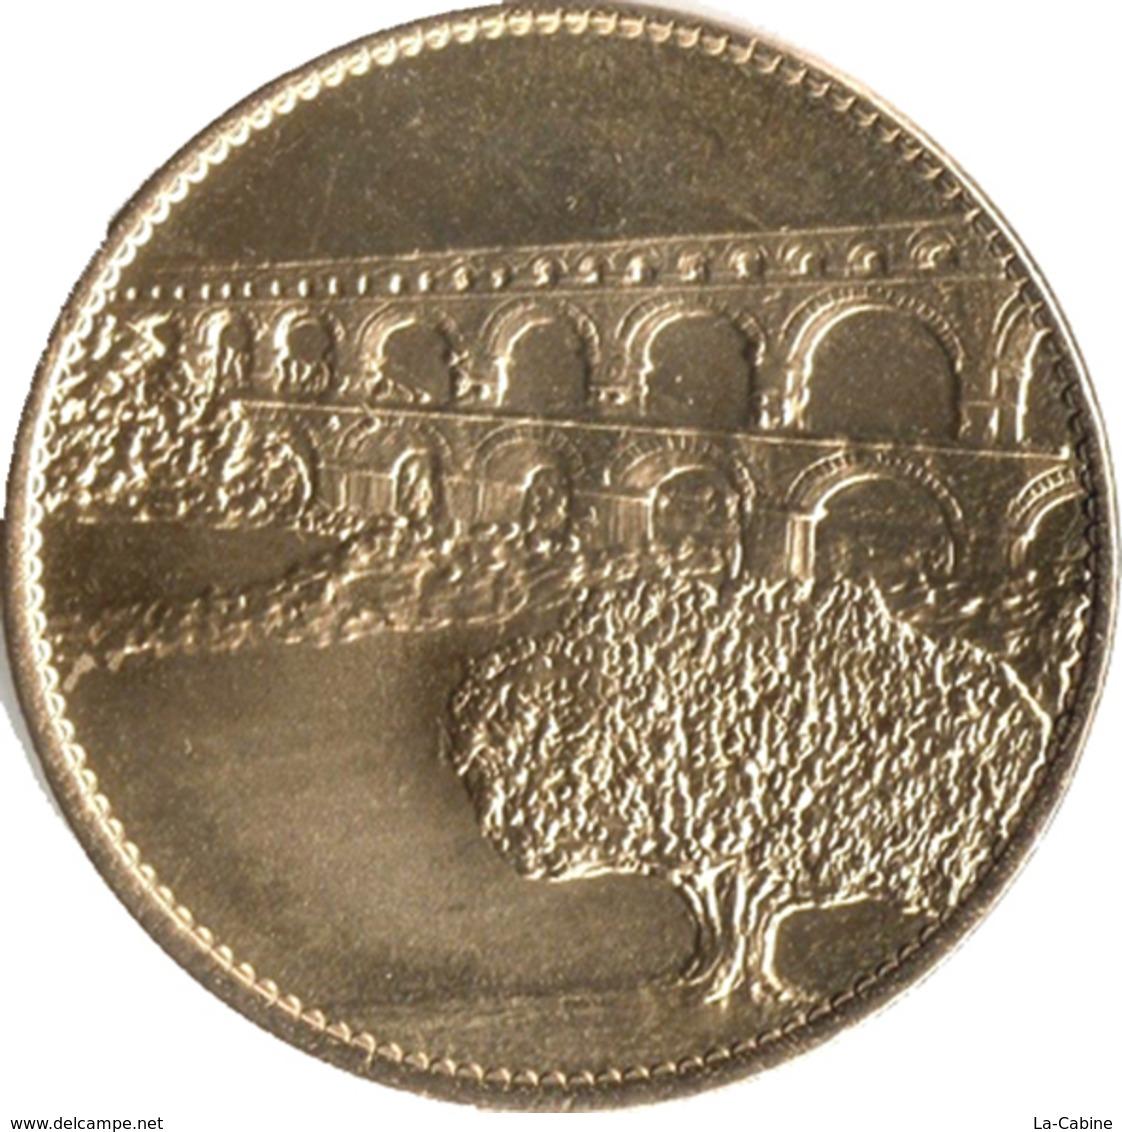 30 VERS PONT DU GARD REVERS OLIVIER MÉDAILLE SOUVENIR ARTHUS BERTRAND 2015 JETON TOURISTIQUE MEDALS TOKENS COINS - Arthus Bertrand